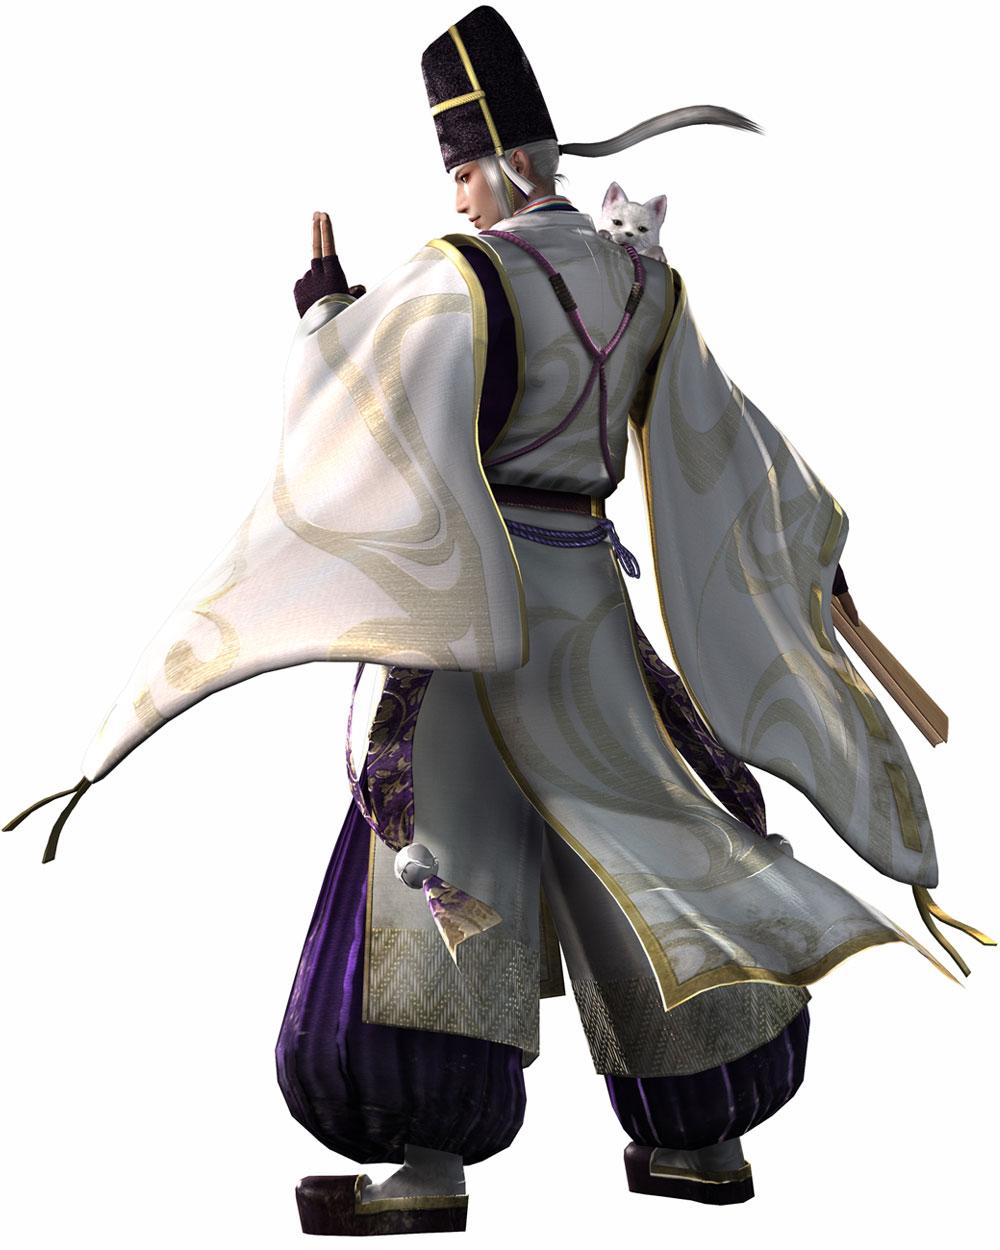 Warriors Orochi 4 Characters: Warriors Orochi